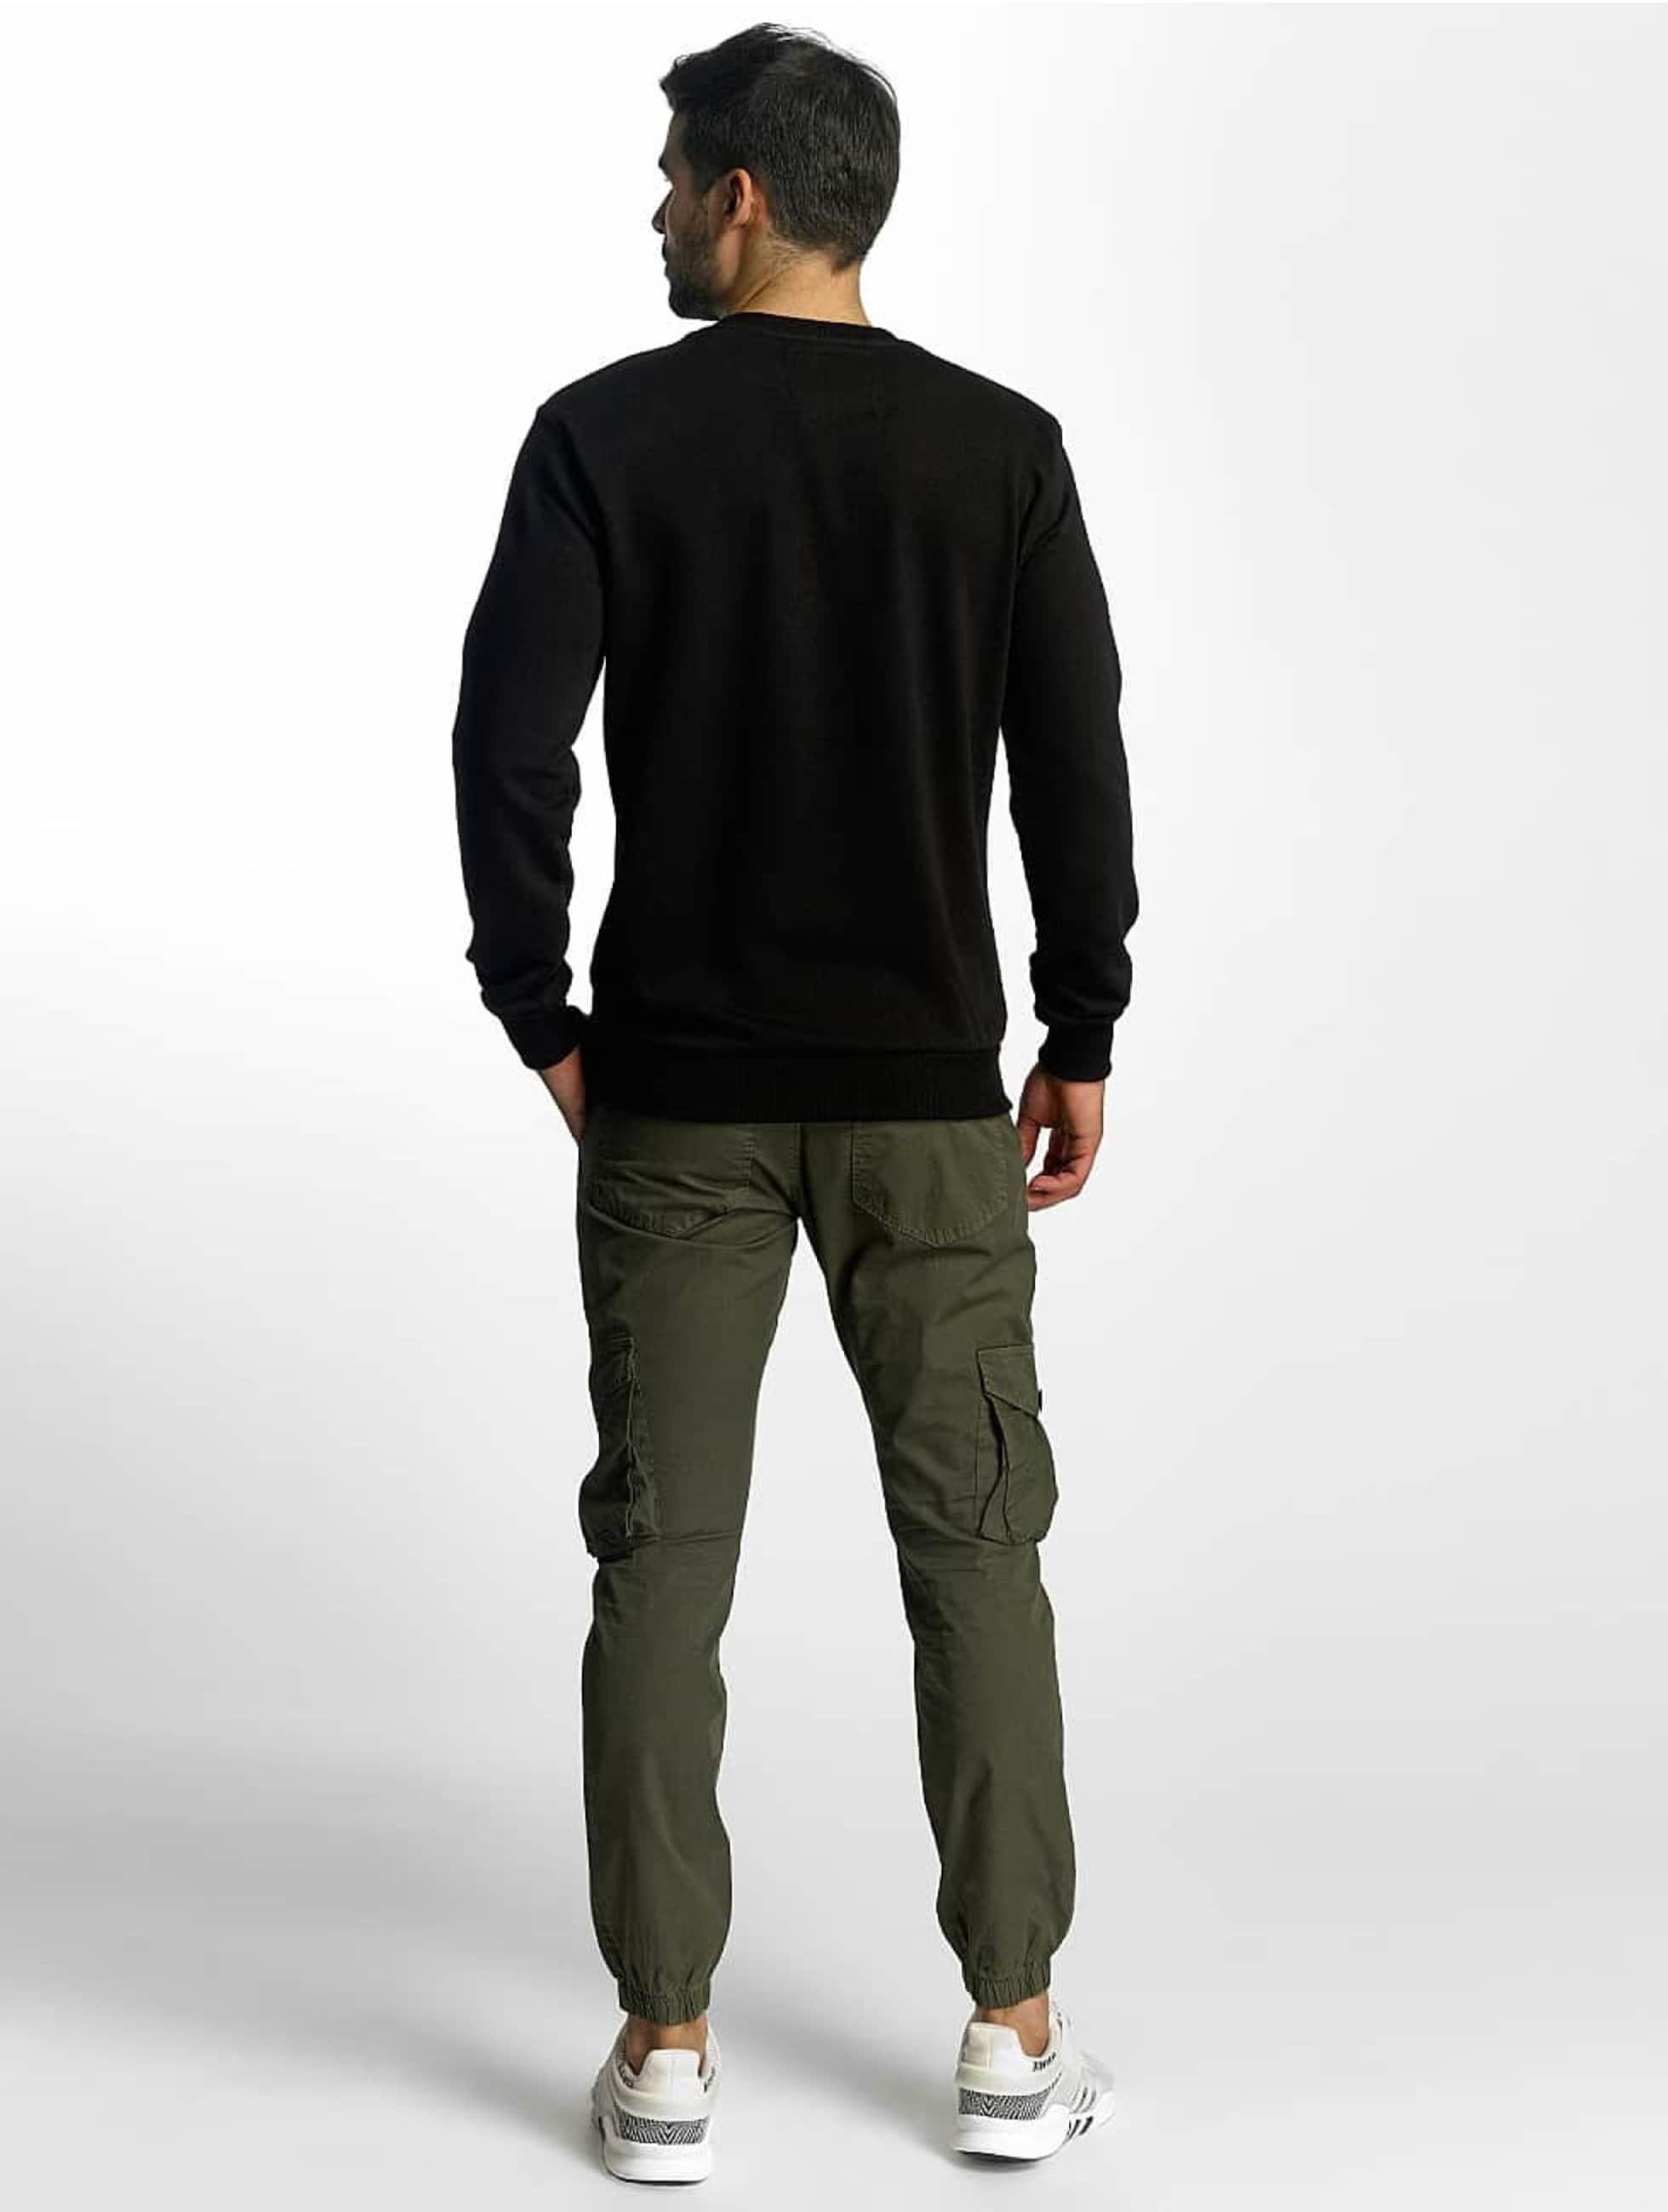 VSCT Clubwear Spodnie Chino/Cargo Noah Flight khaki